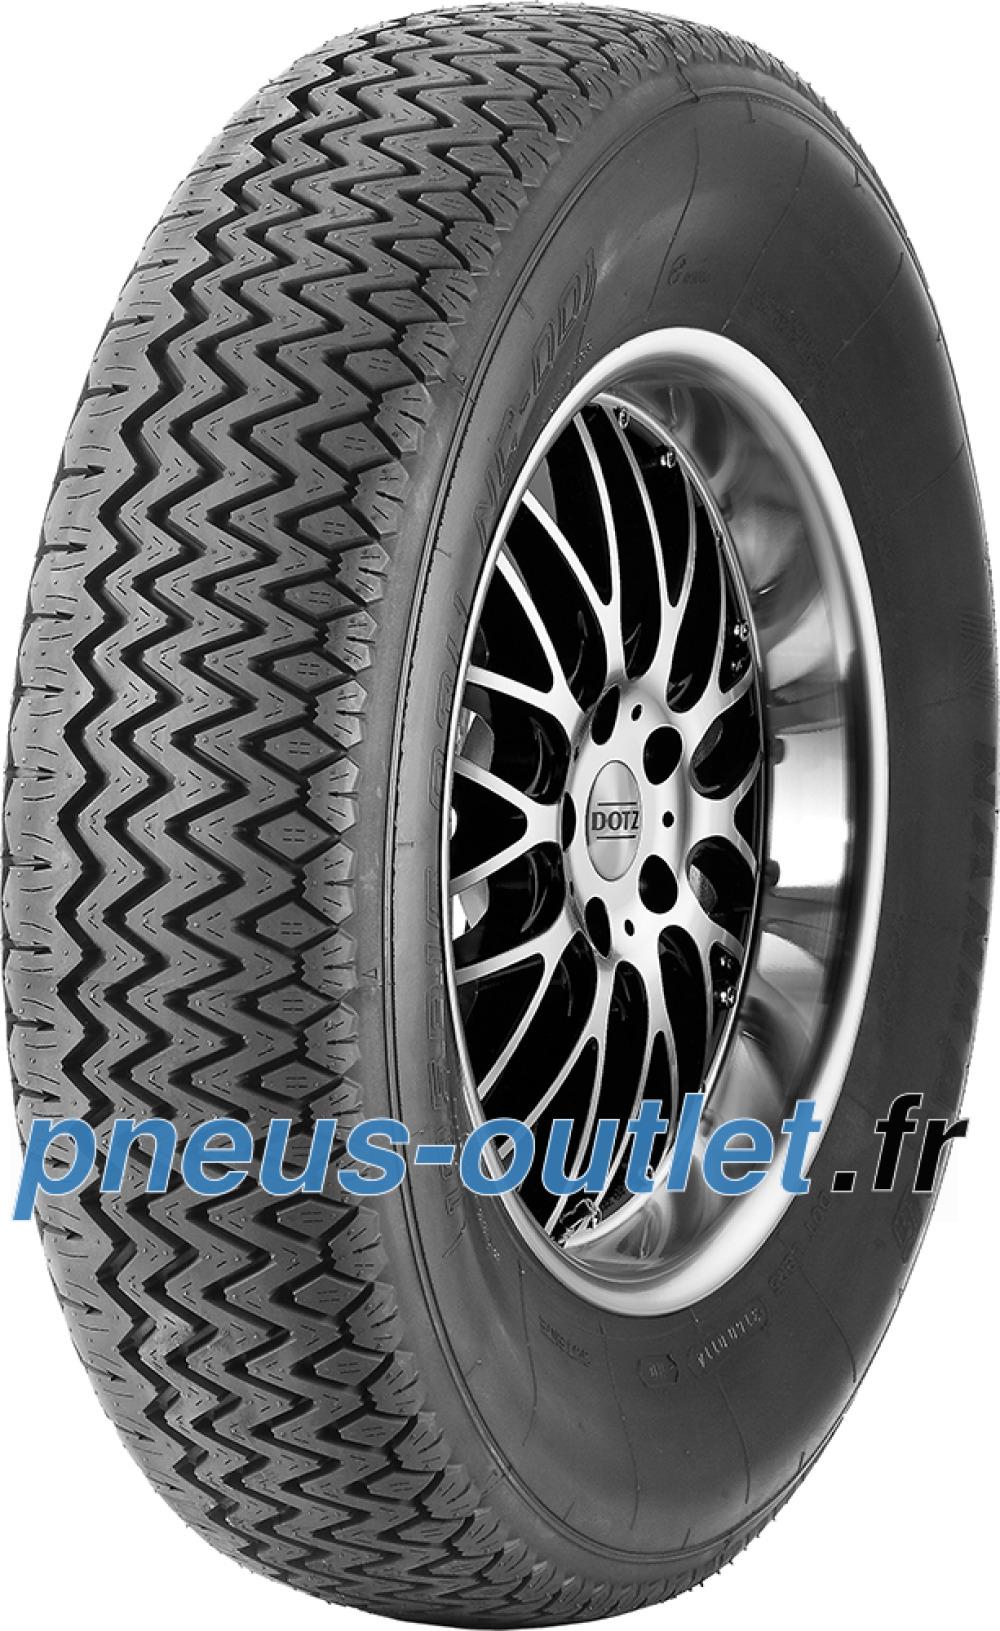 pneus wsw achat vente de pneus pas cher. Black Bedroom Furniture Sets. Home Design Ideas